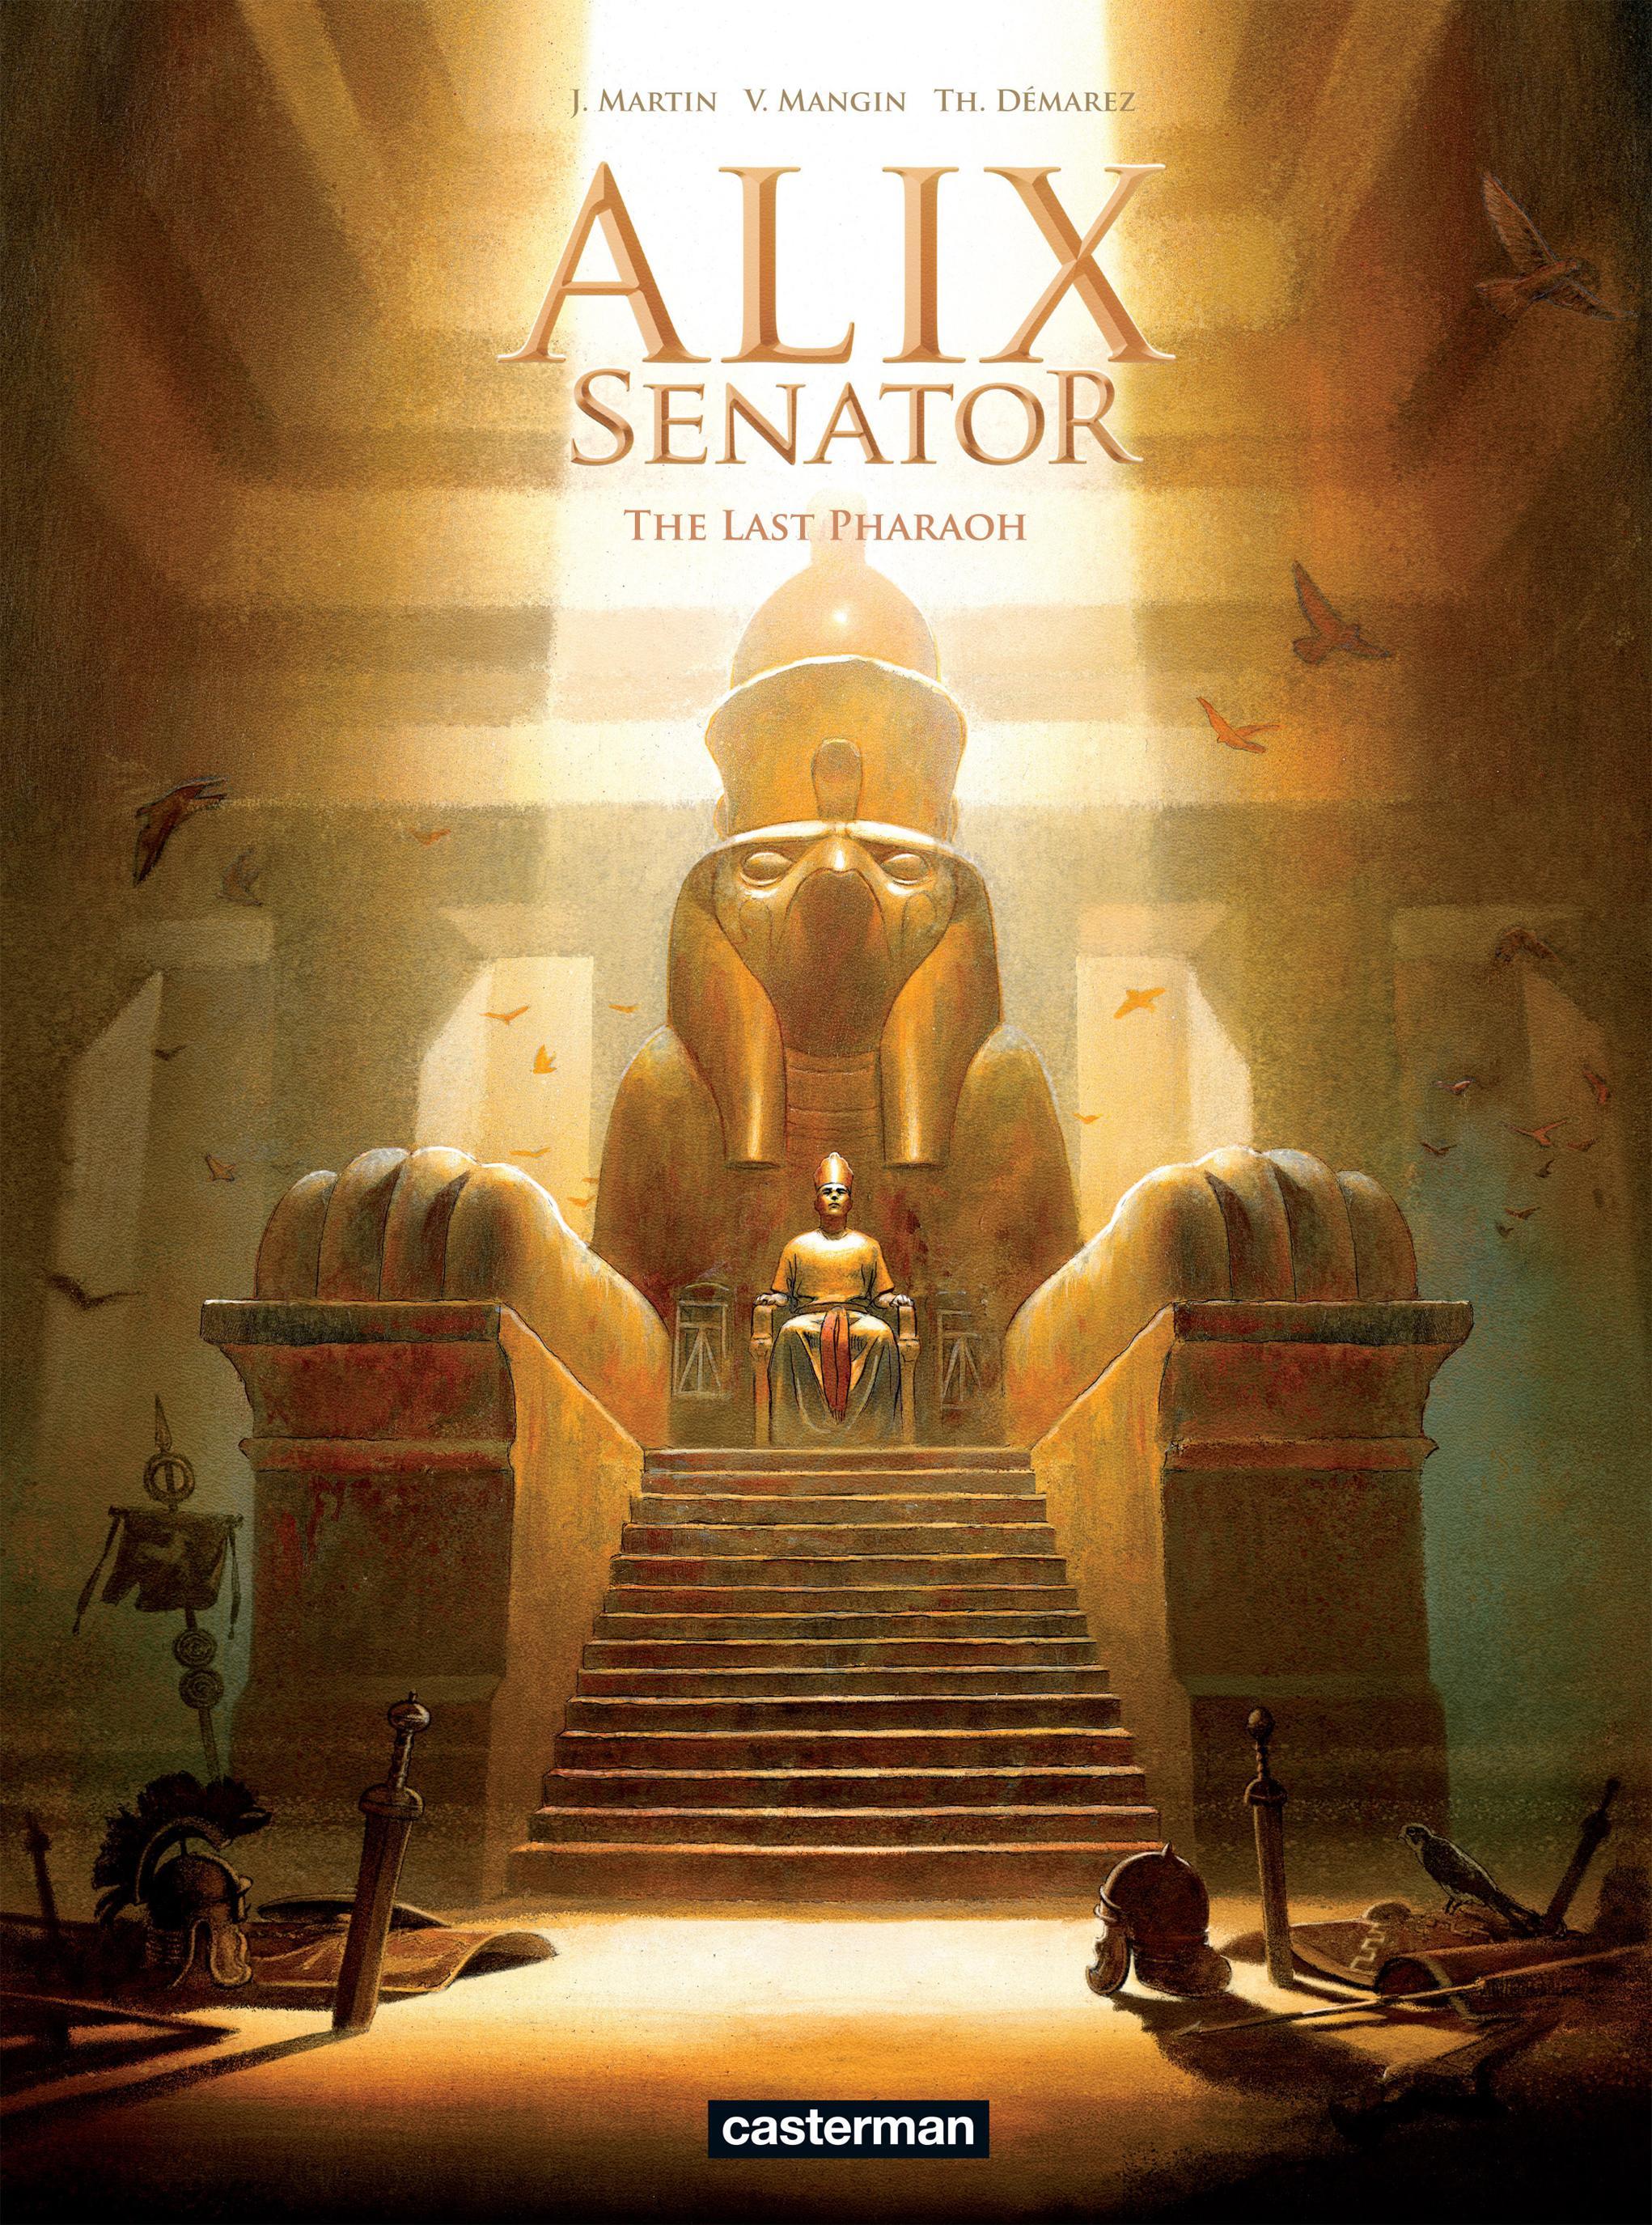 Alix Senator 02-The Last Pharoah 2013 Scanlation phillywilly